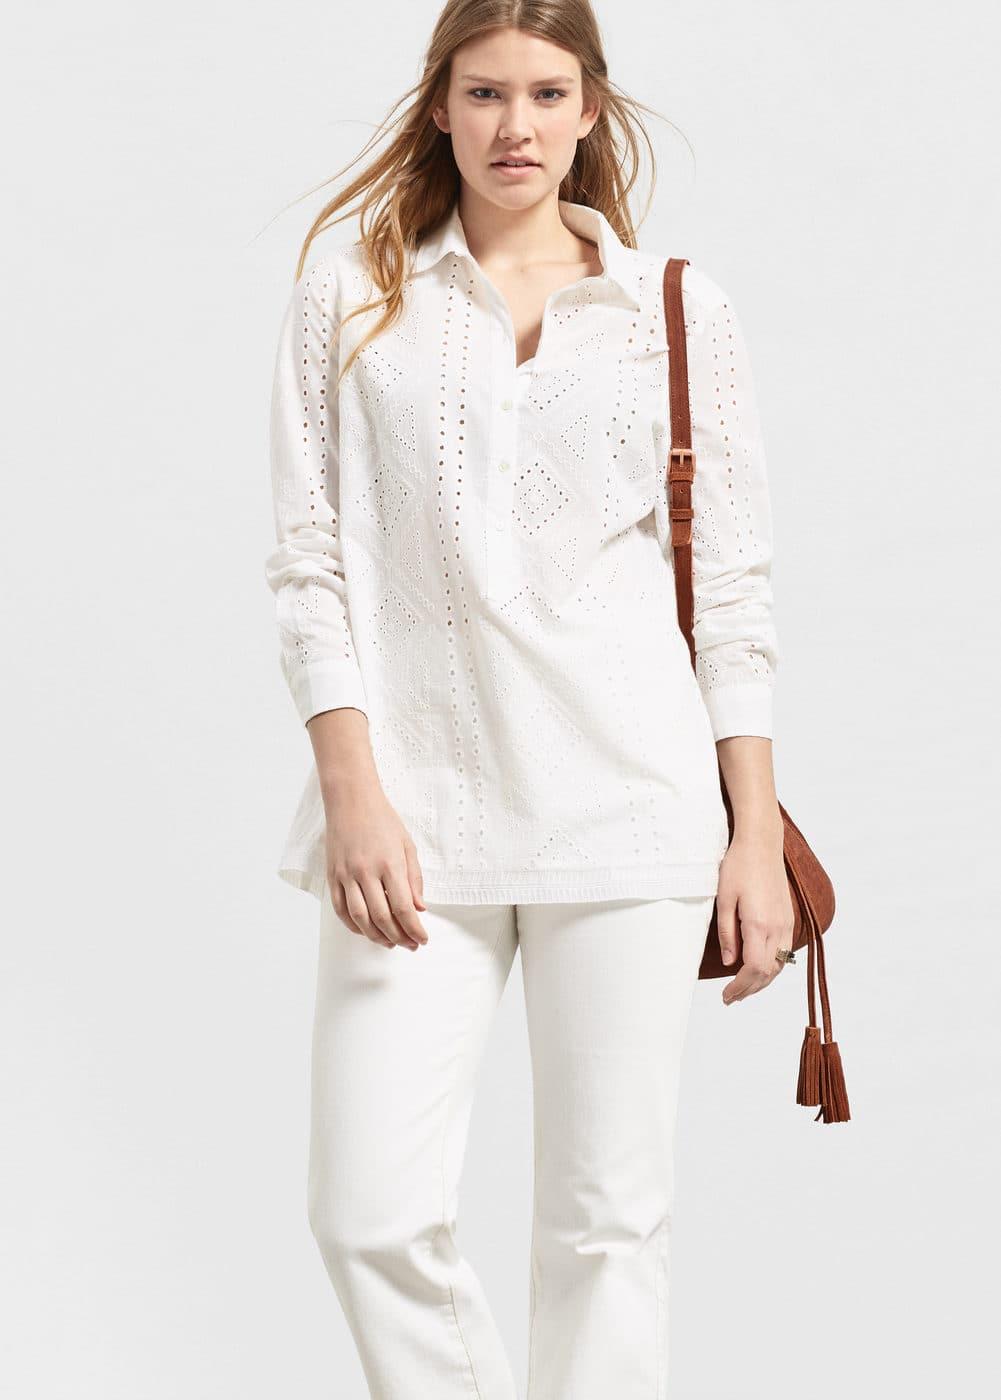 Openwork cotton blouse | VIOLETA BY MANGO